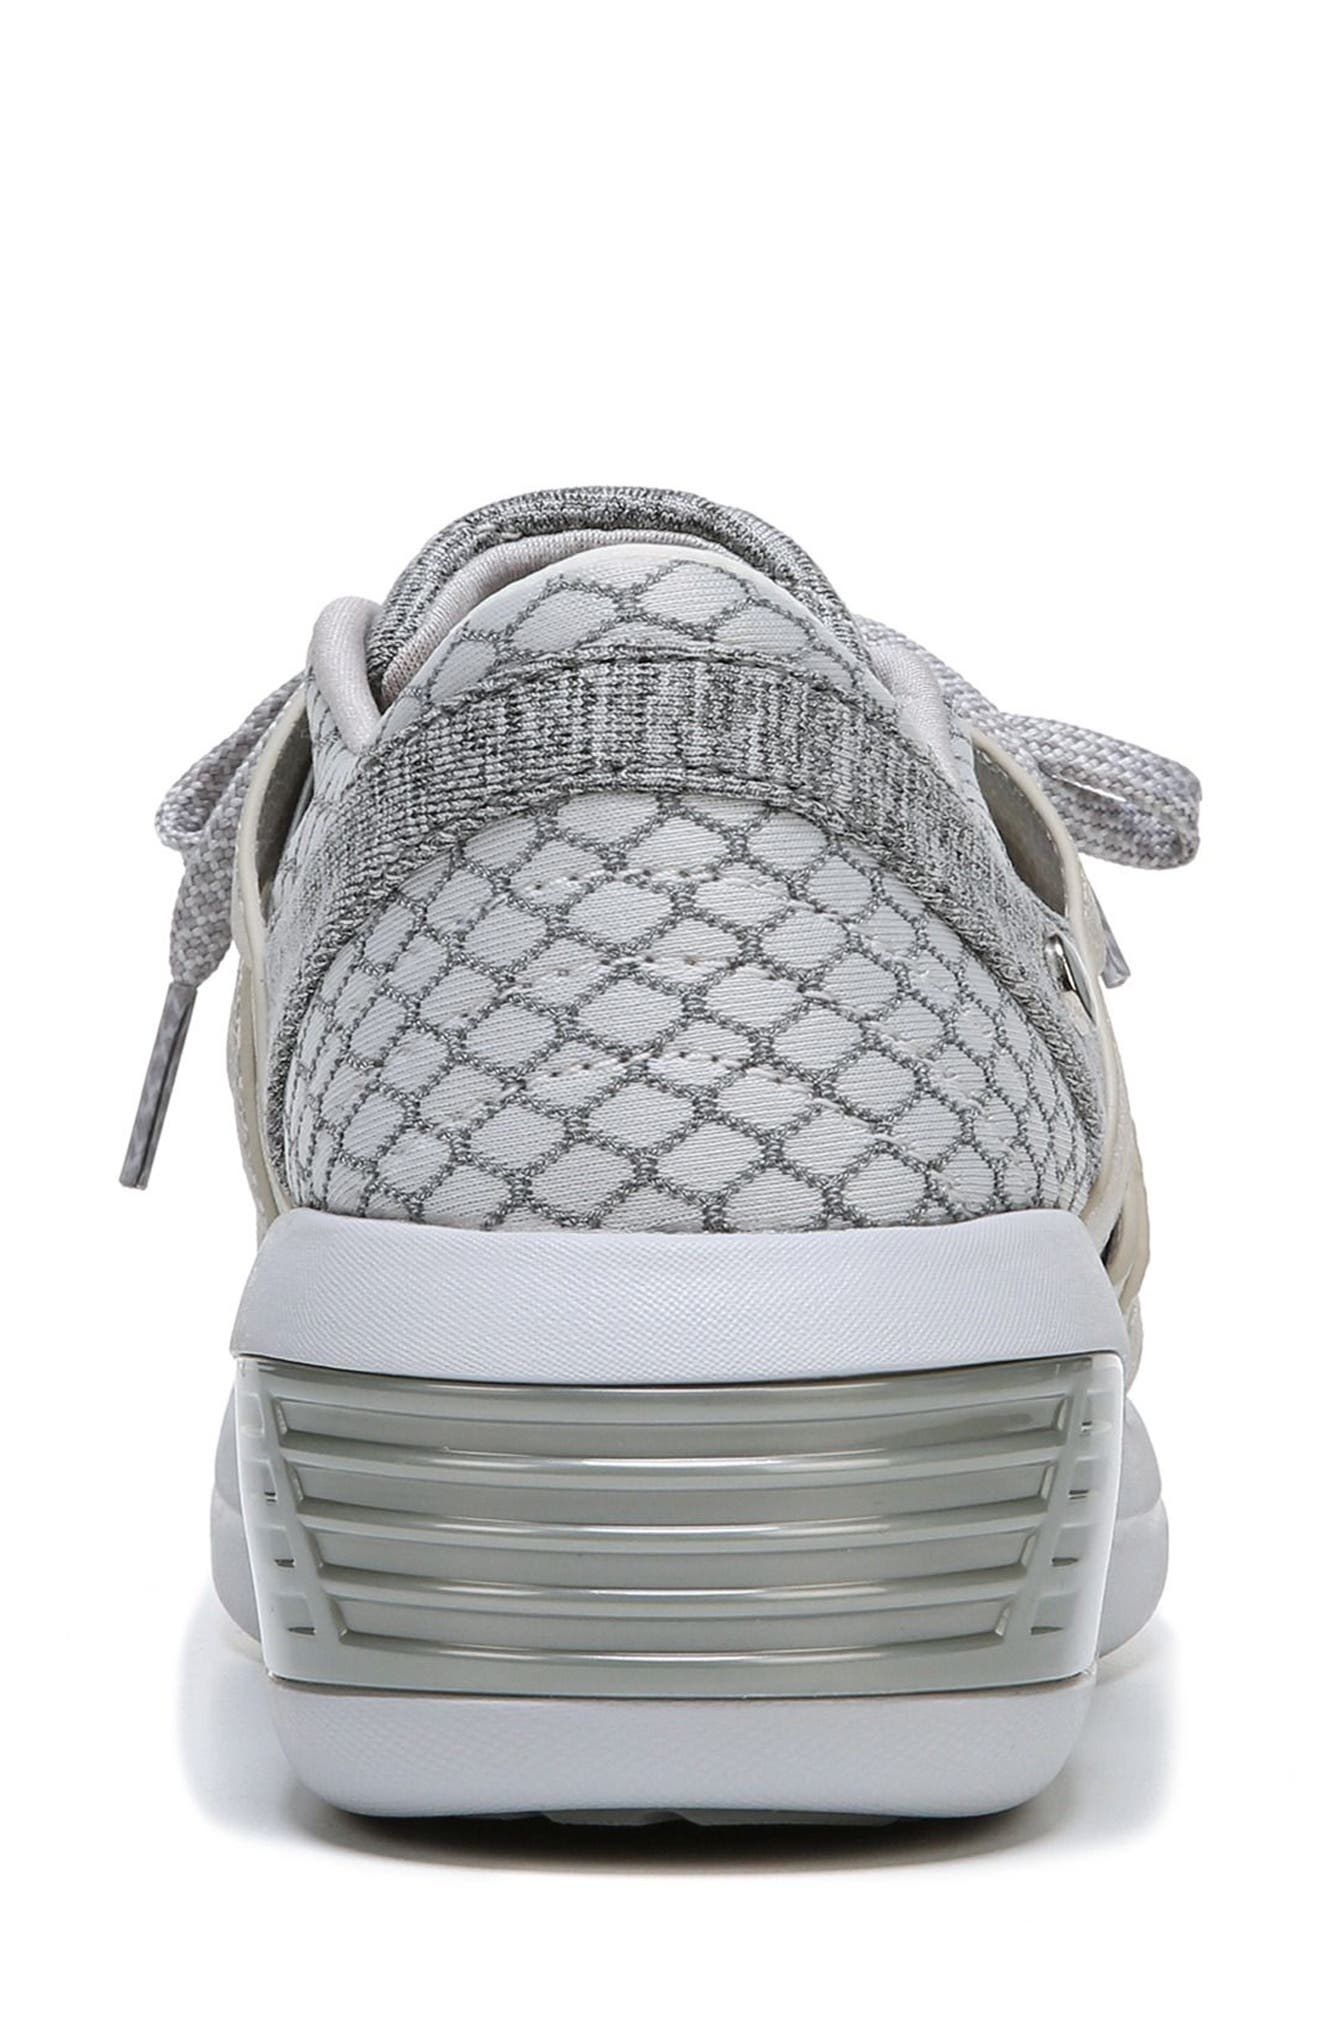 Flicker Sneaker,                             Alternate thumbnail 6, color,                             Grey Fabric